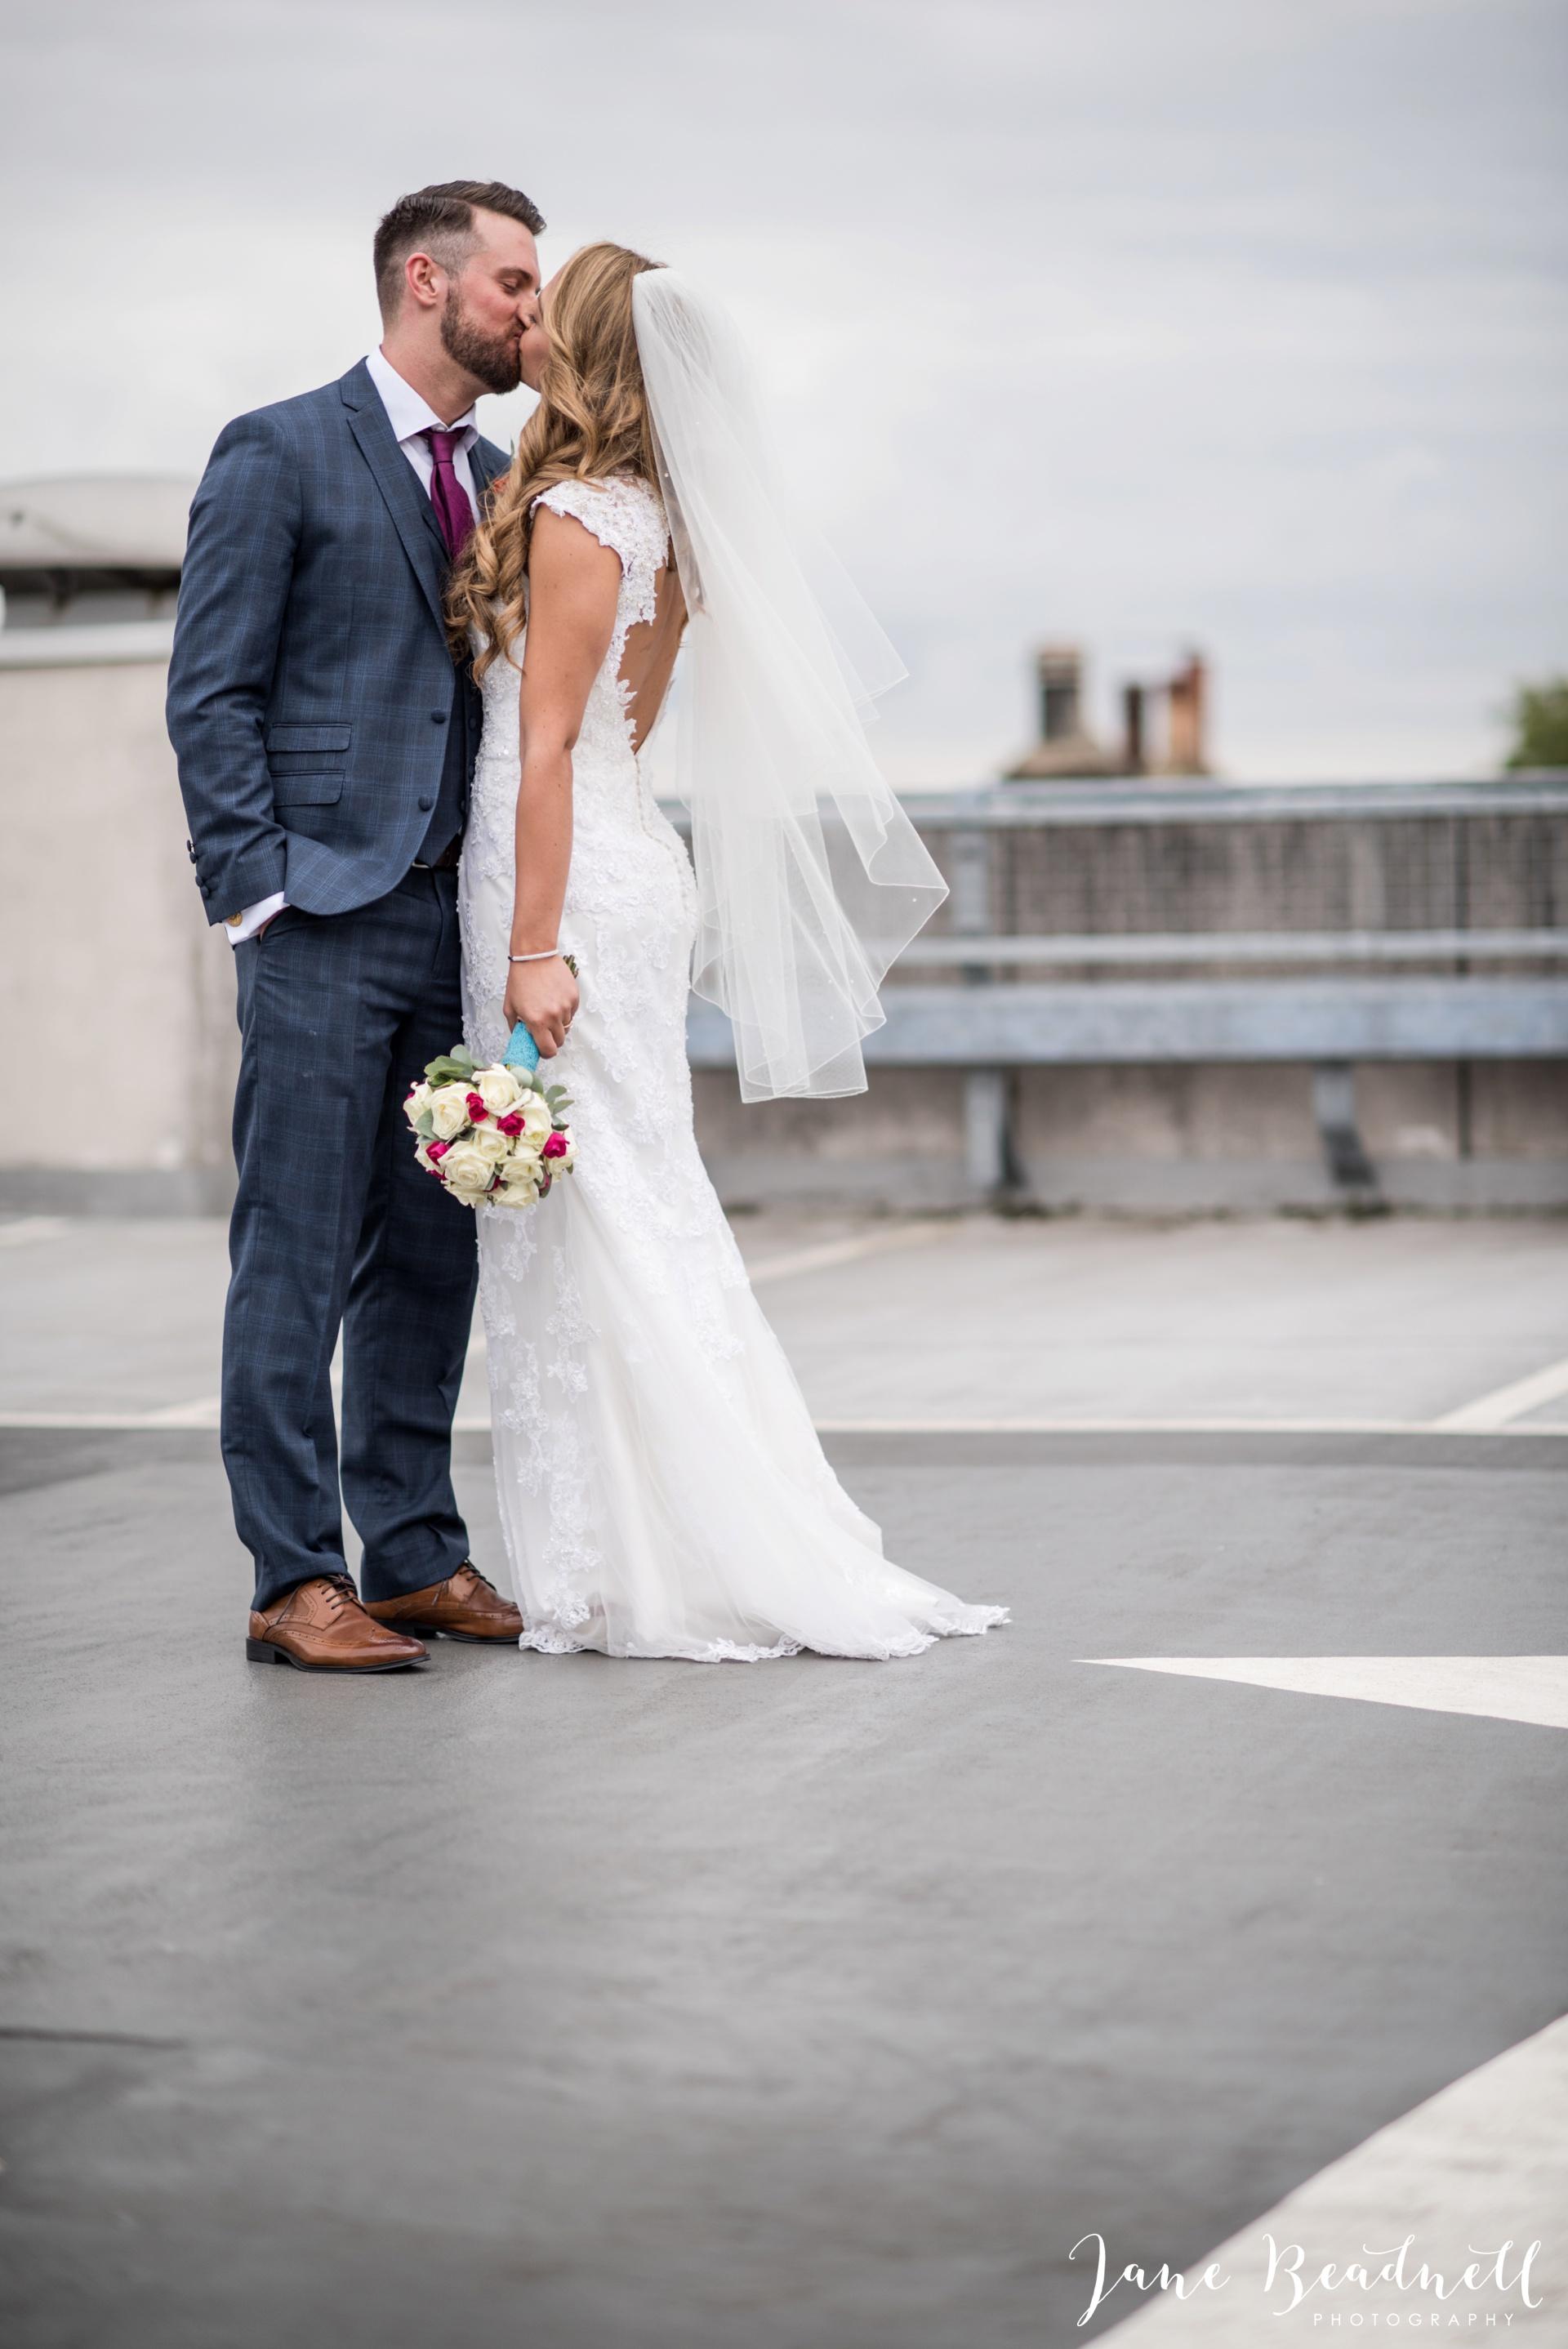 Jane Beadnell fine art wedding photographer Harrogate_0013